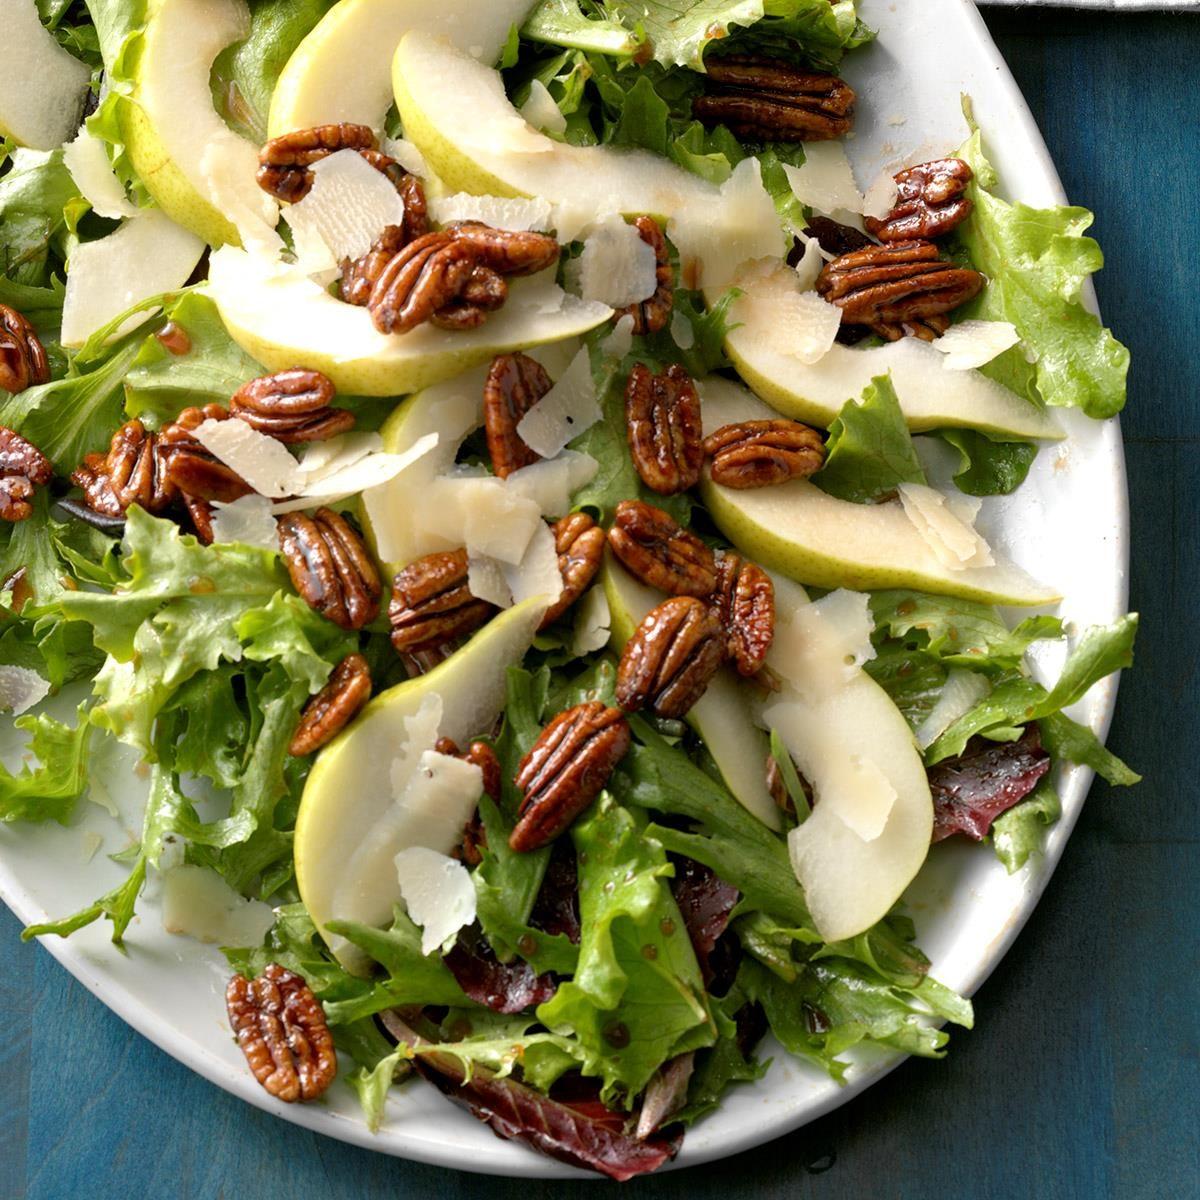 Day 29: Taste-of-Fall Salad